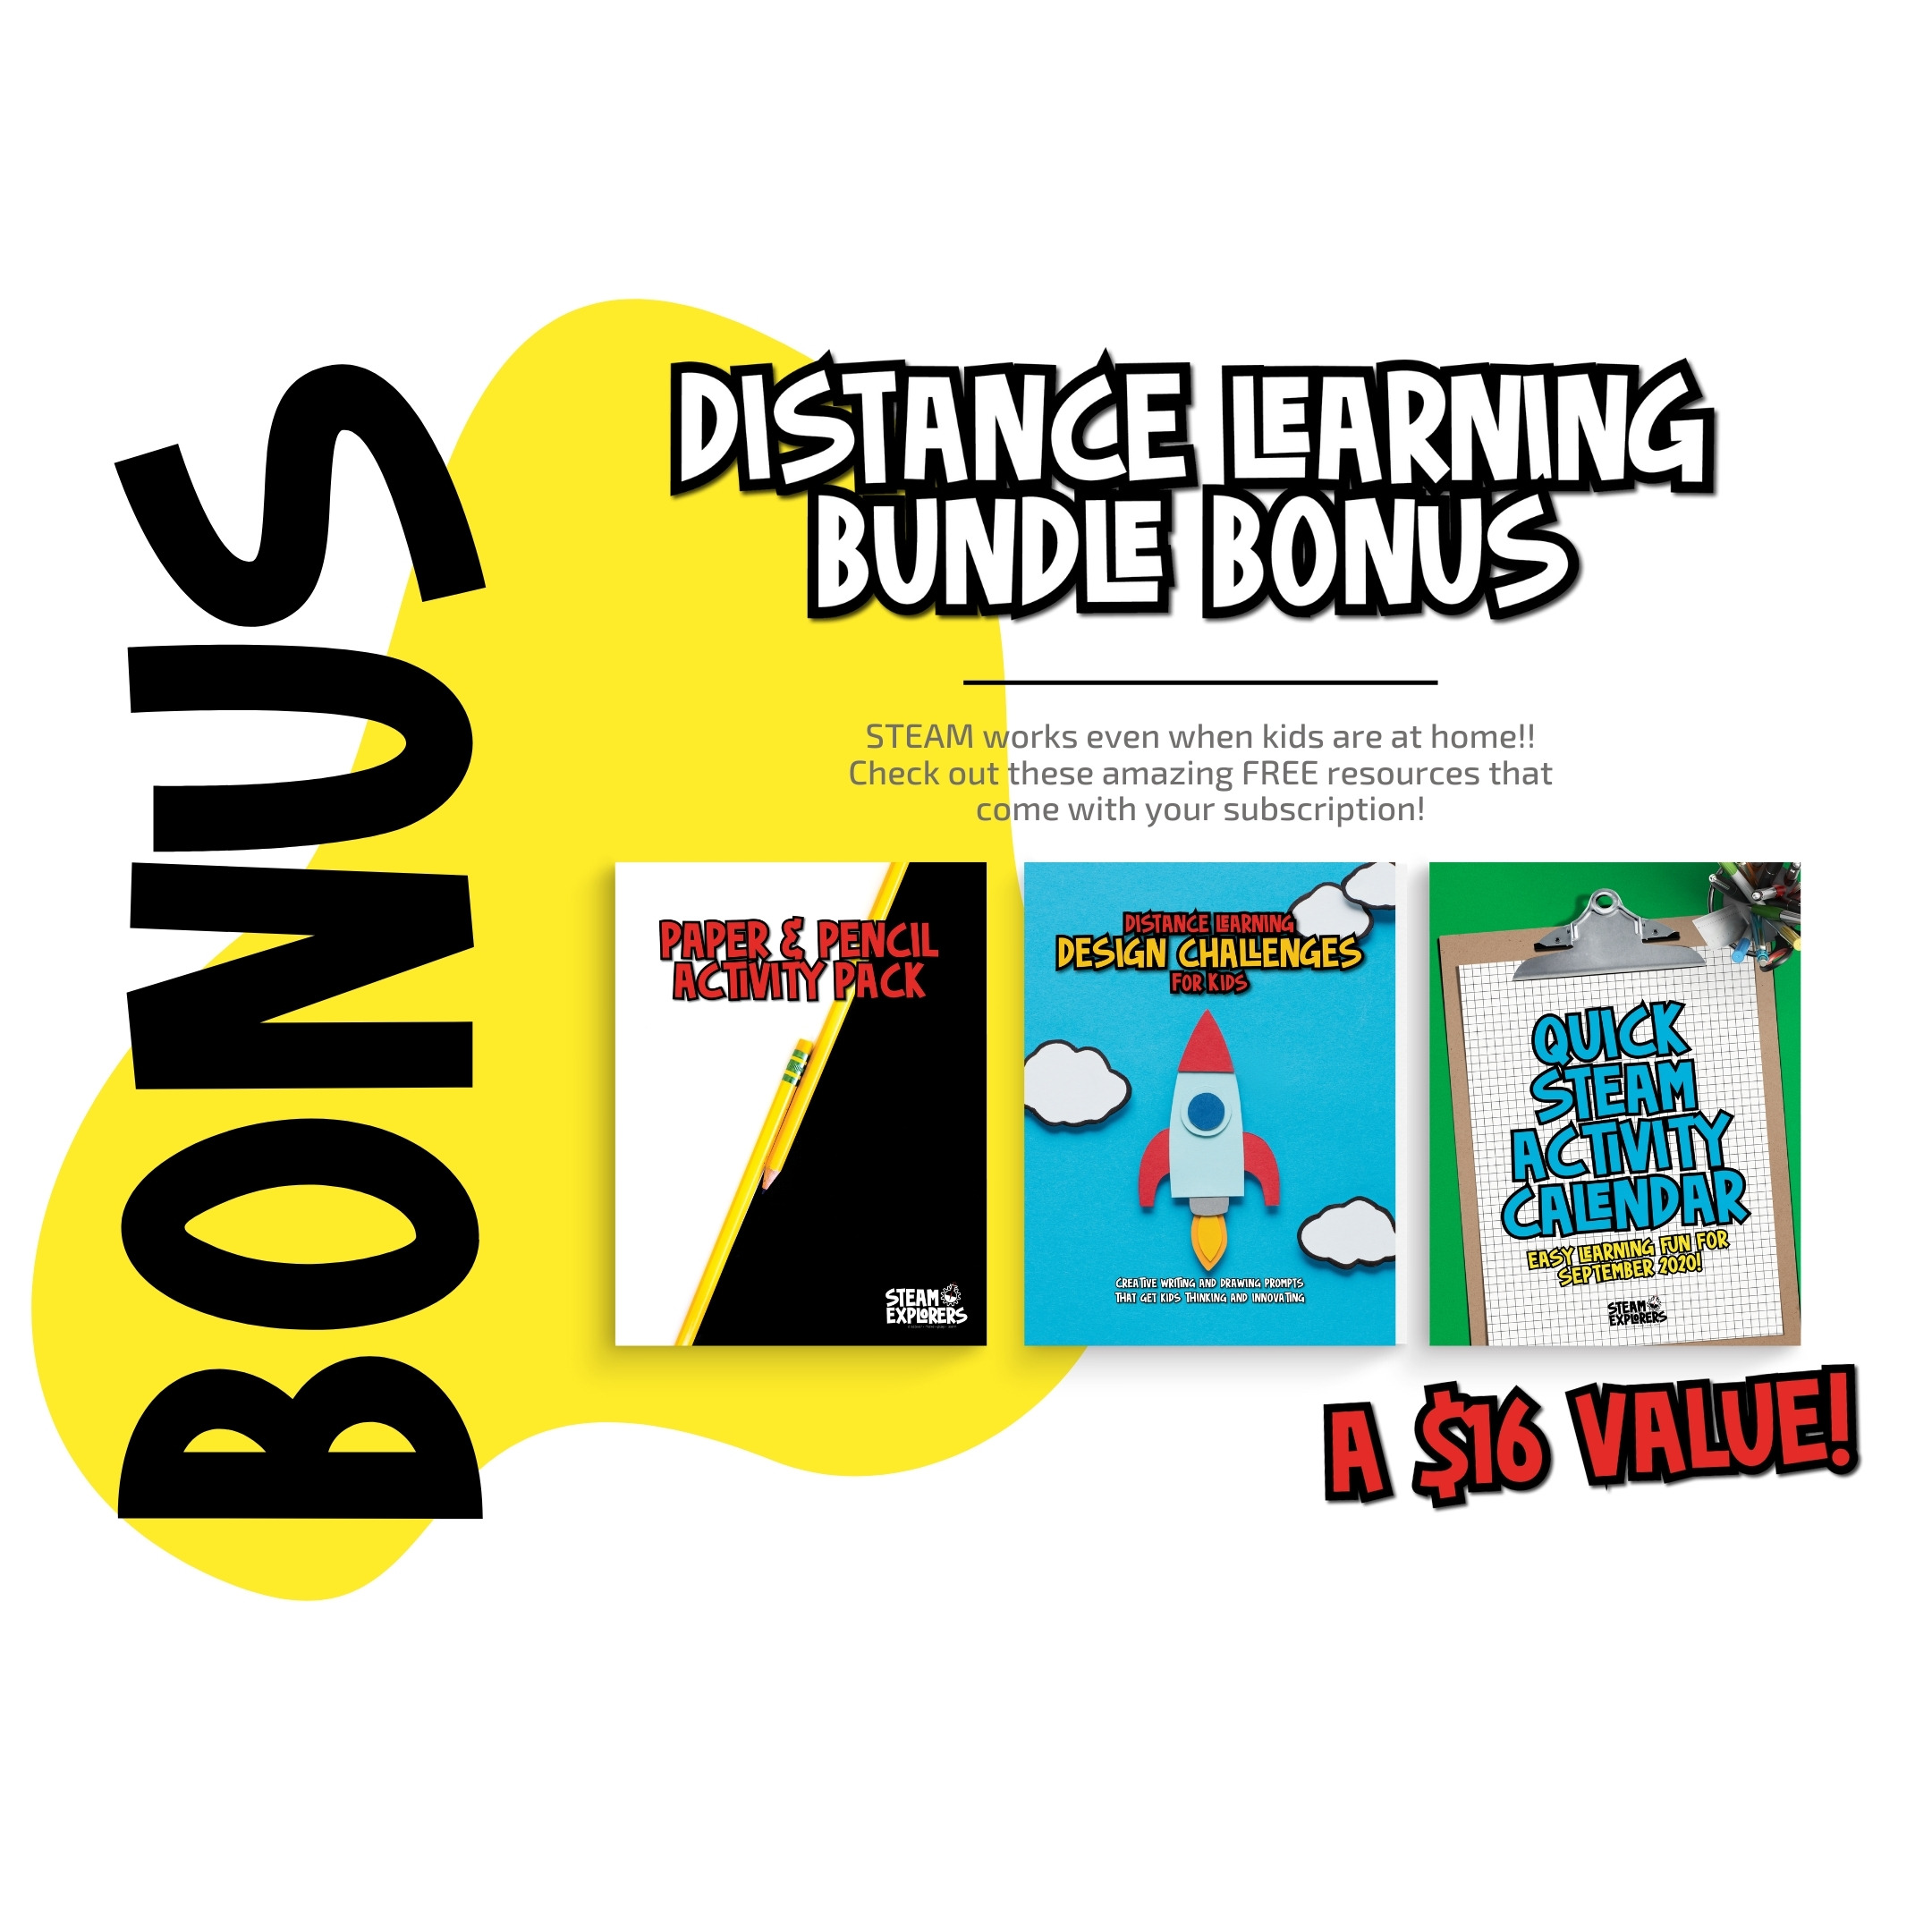 distance learning bonus 1080x1080